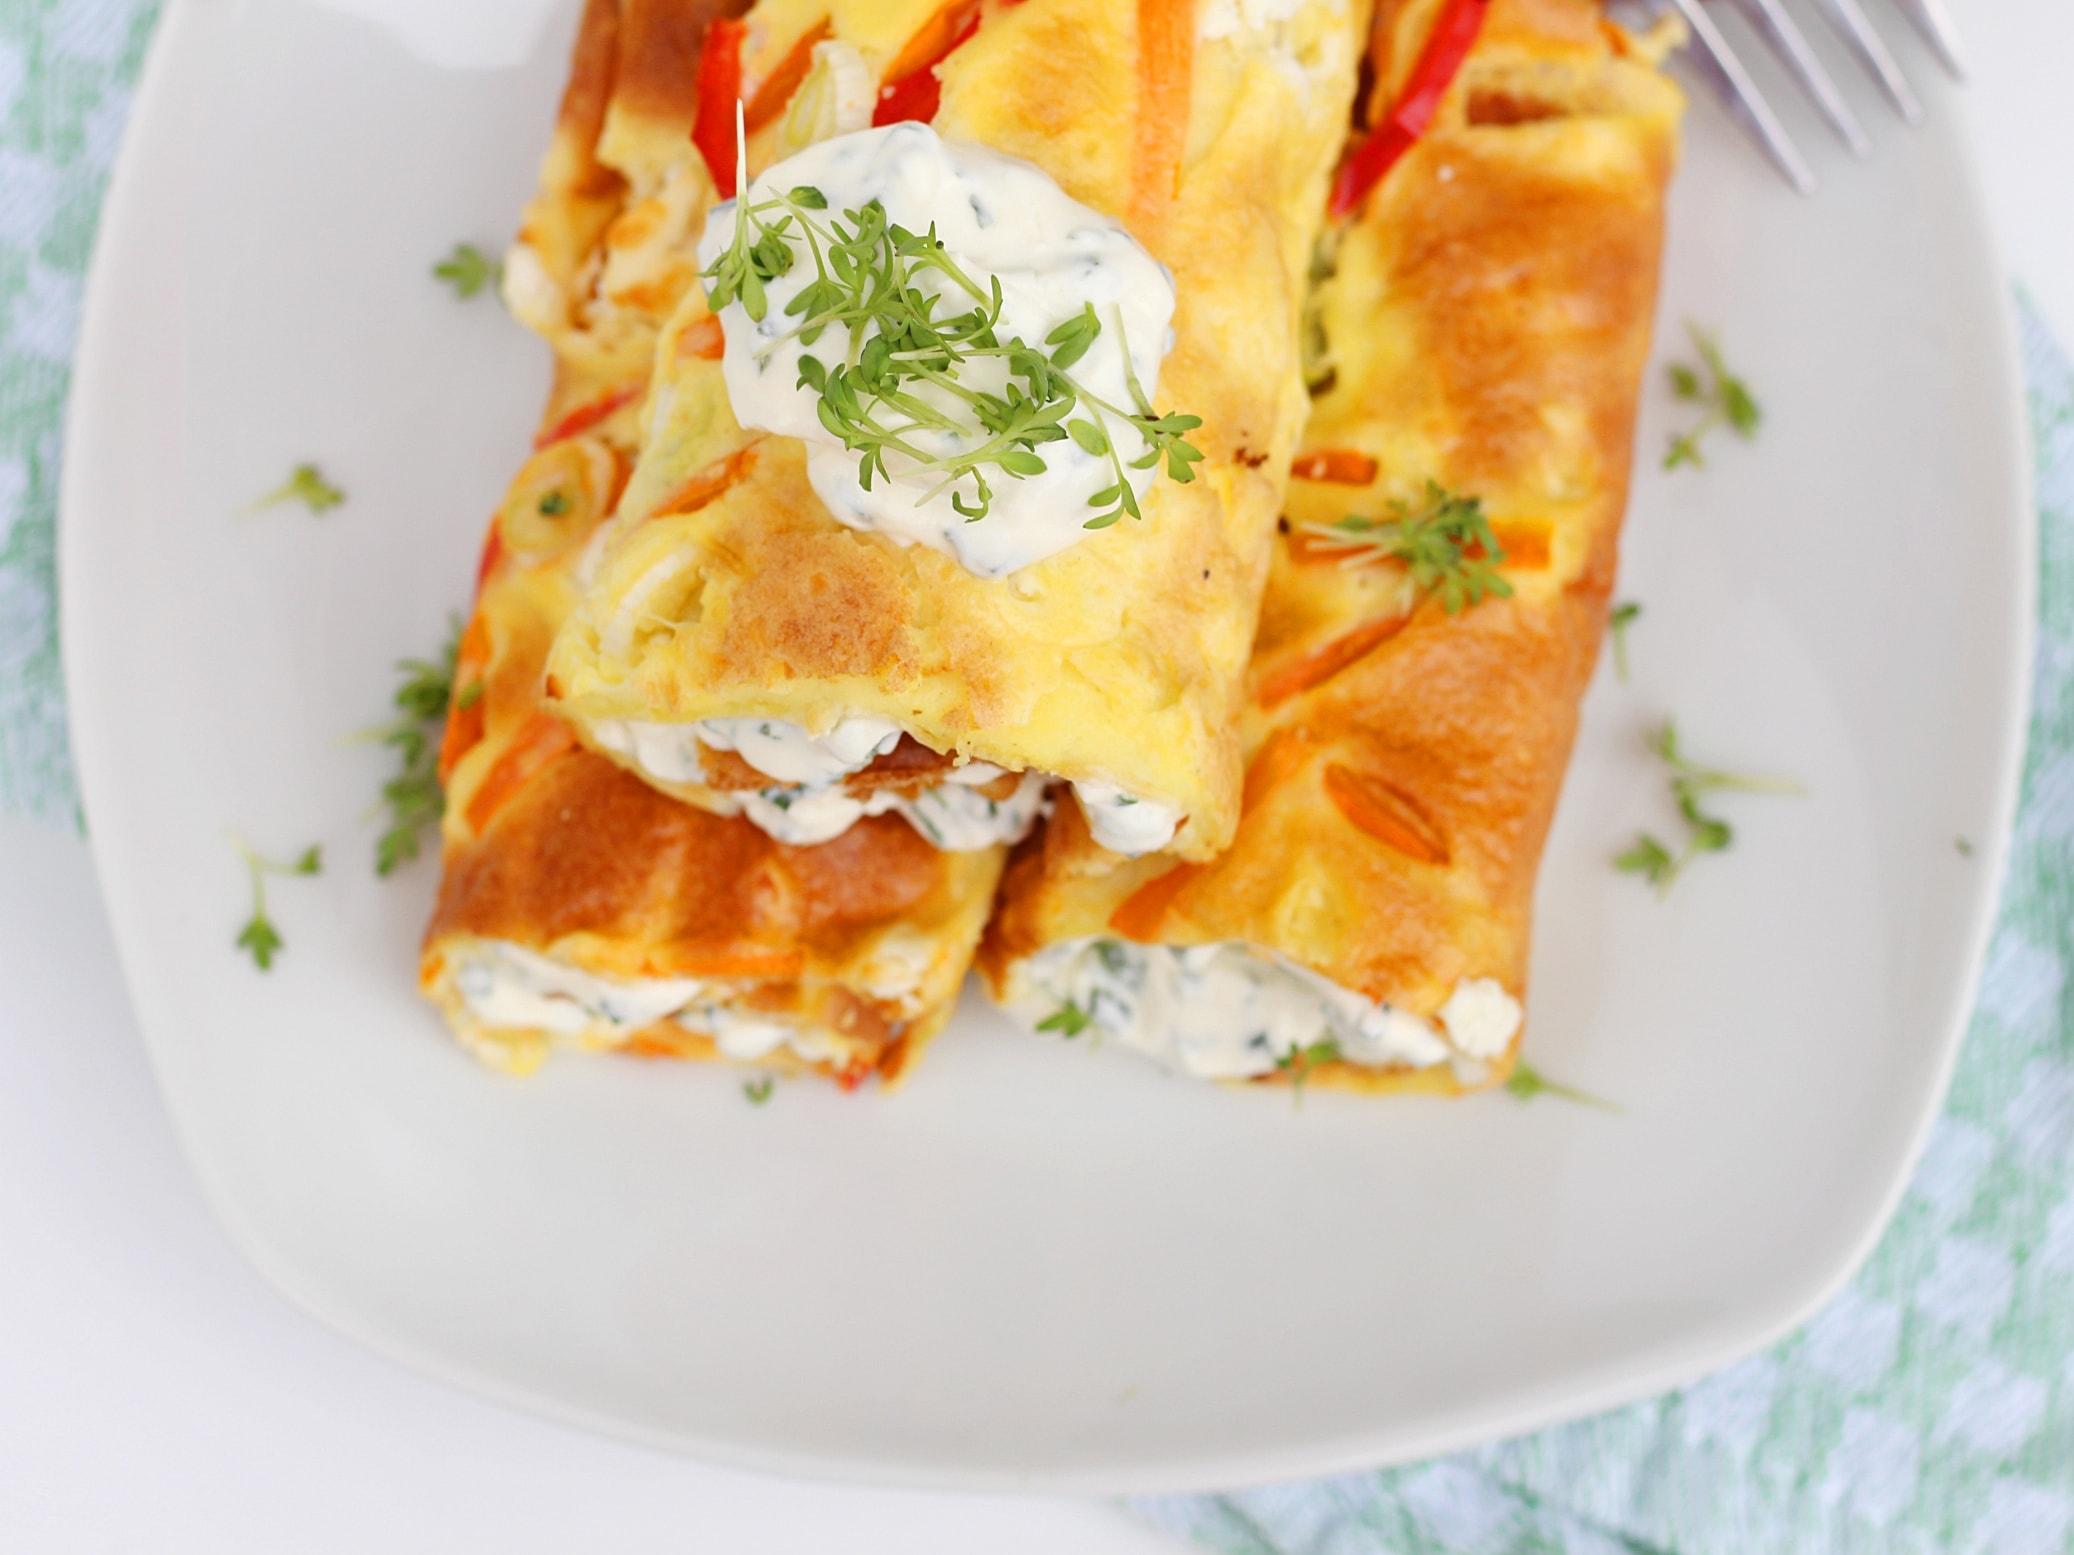 Ofenpfannkuchen, Feta, Gemüse